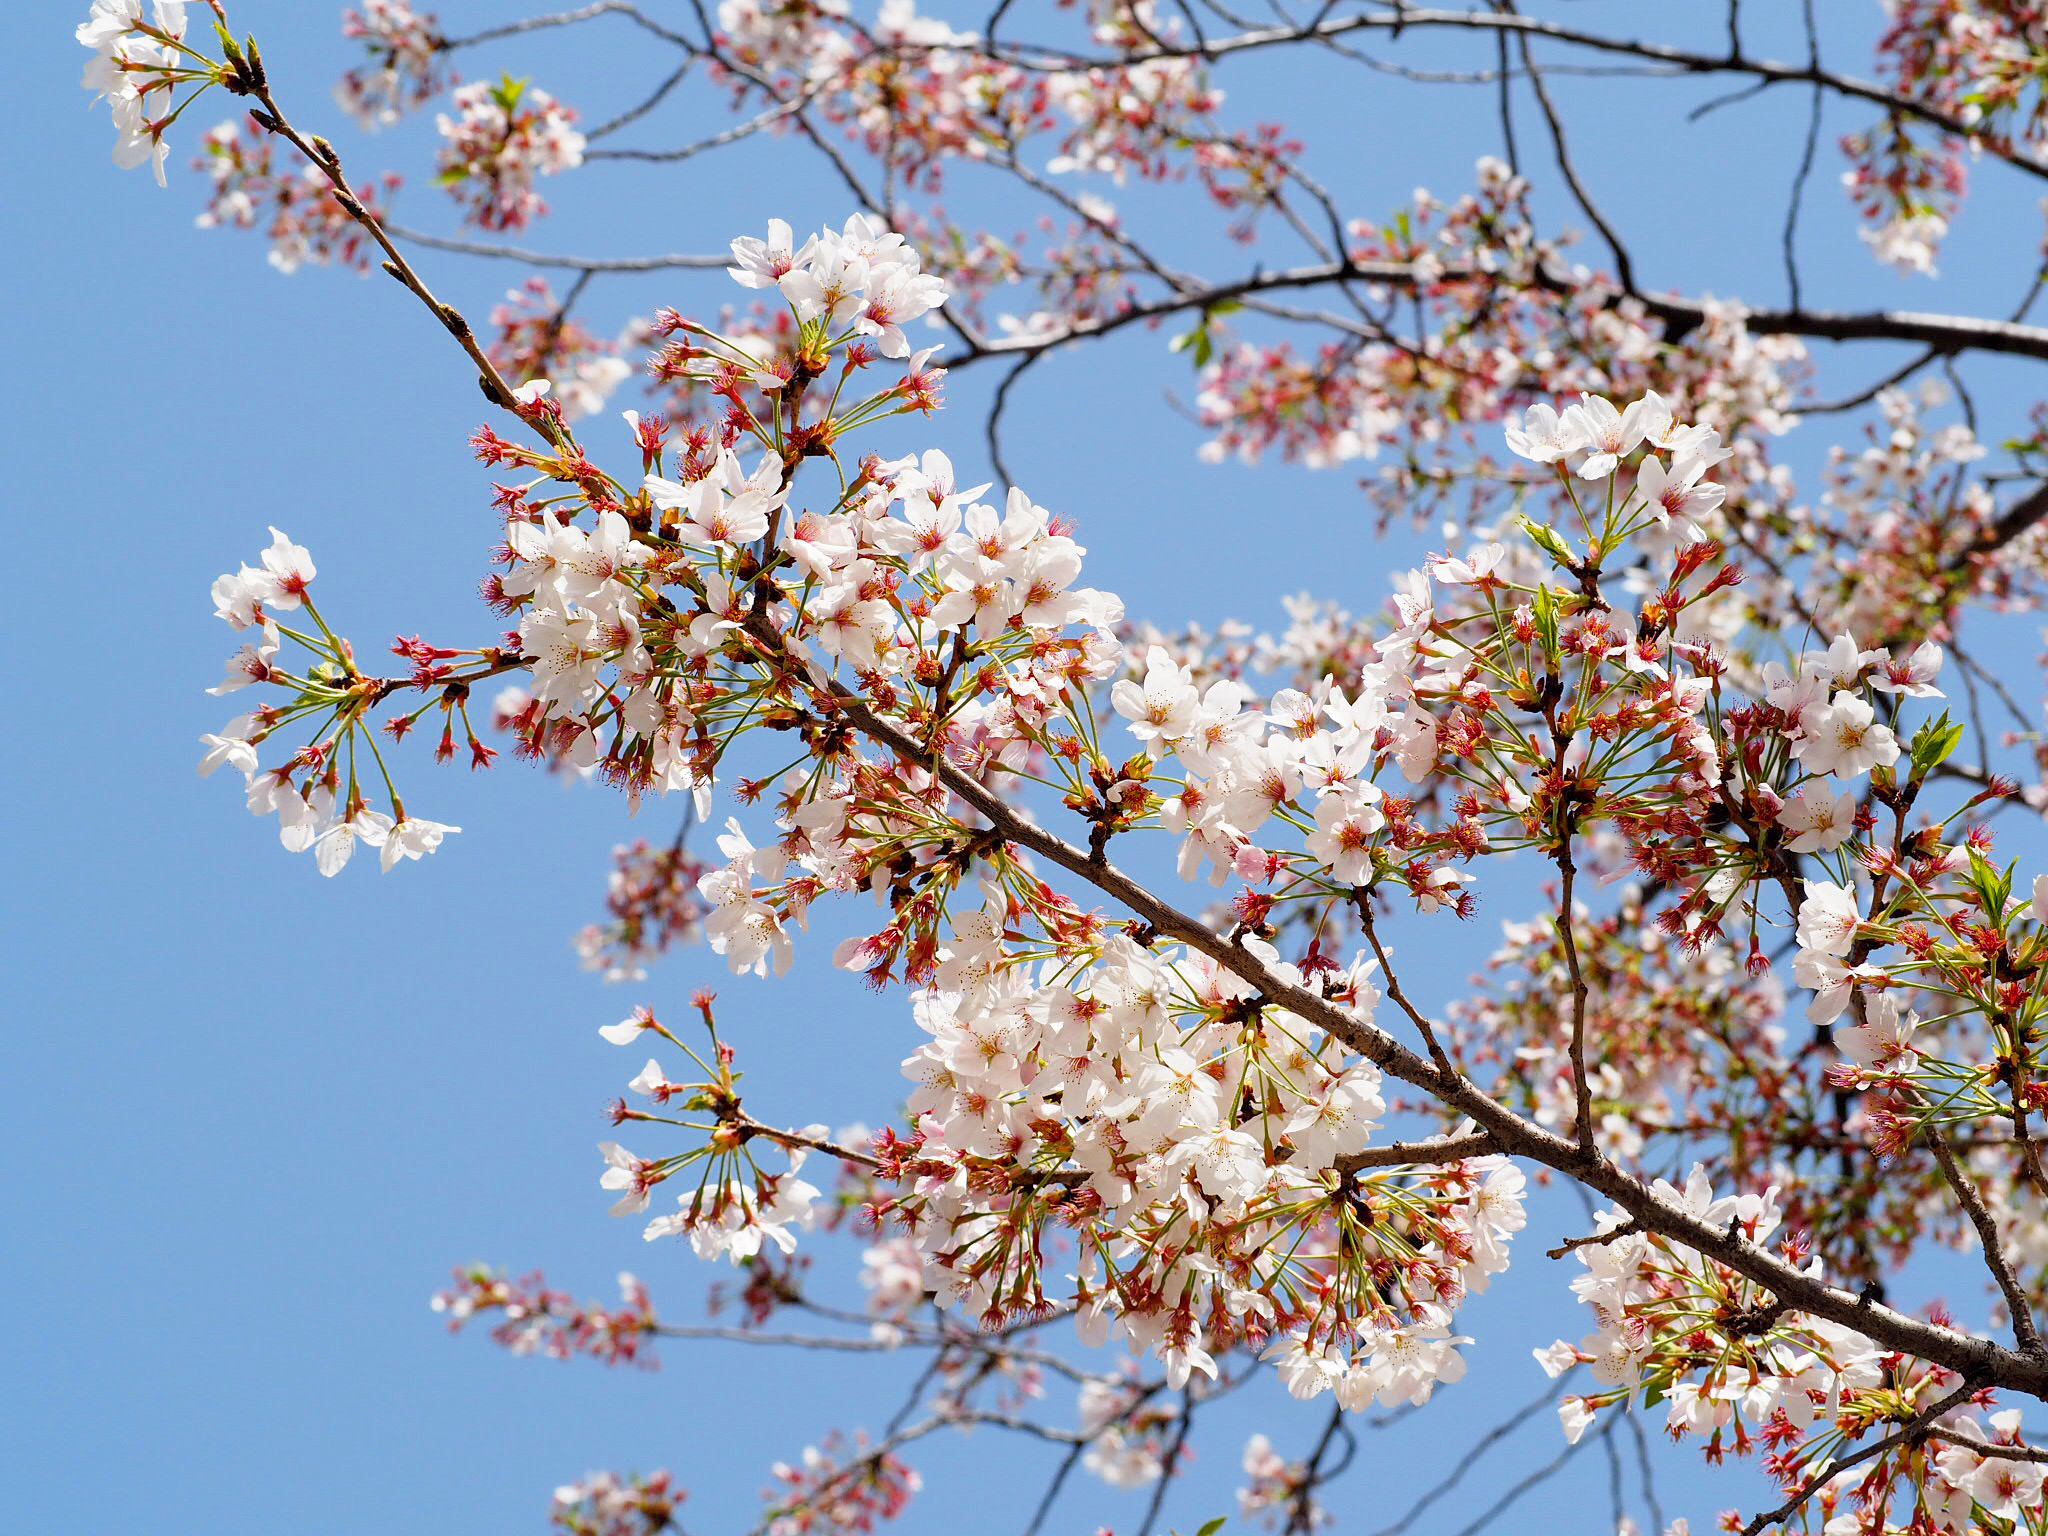 【Fly for ALL #大空を見上げよう】東京の空にニコちゃんマークが出現!一瞬の幸せをシェア☻♡_6